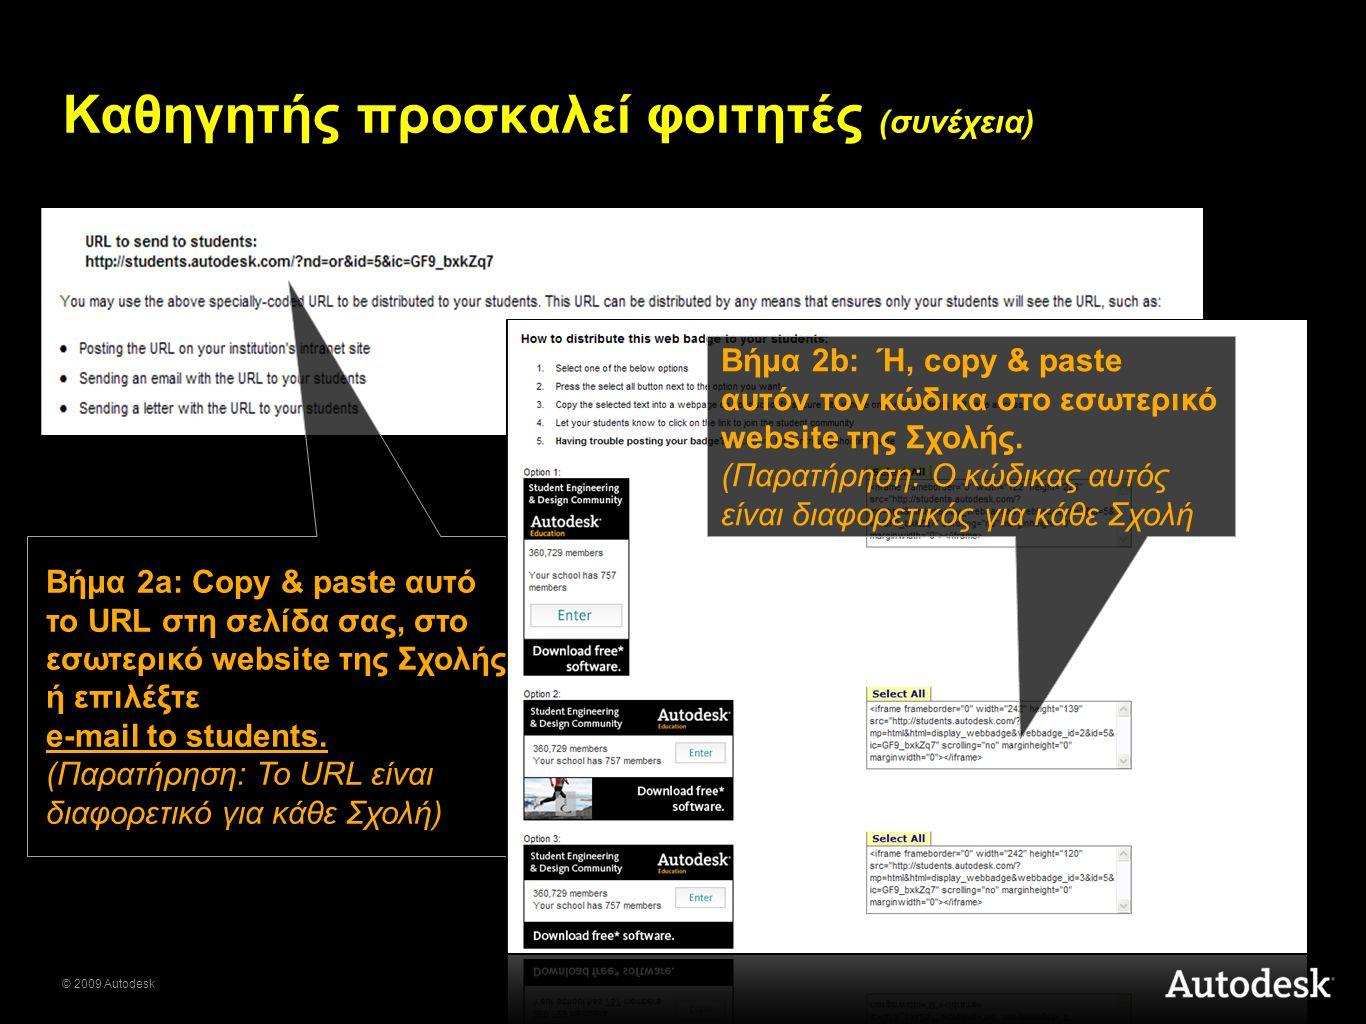 © 2009 Autodesk Καθηγητής προσκαλεί φοιτητές (συνέχεια) Βήμα 2a: Copy & paste αυτό το URL στη σελίδα σας, στο εσωτερικό website της Σχολής ή επιλέξτε